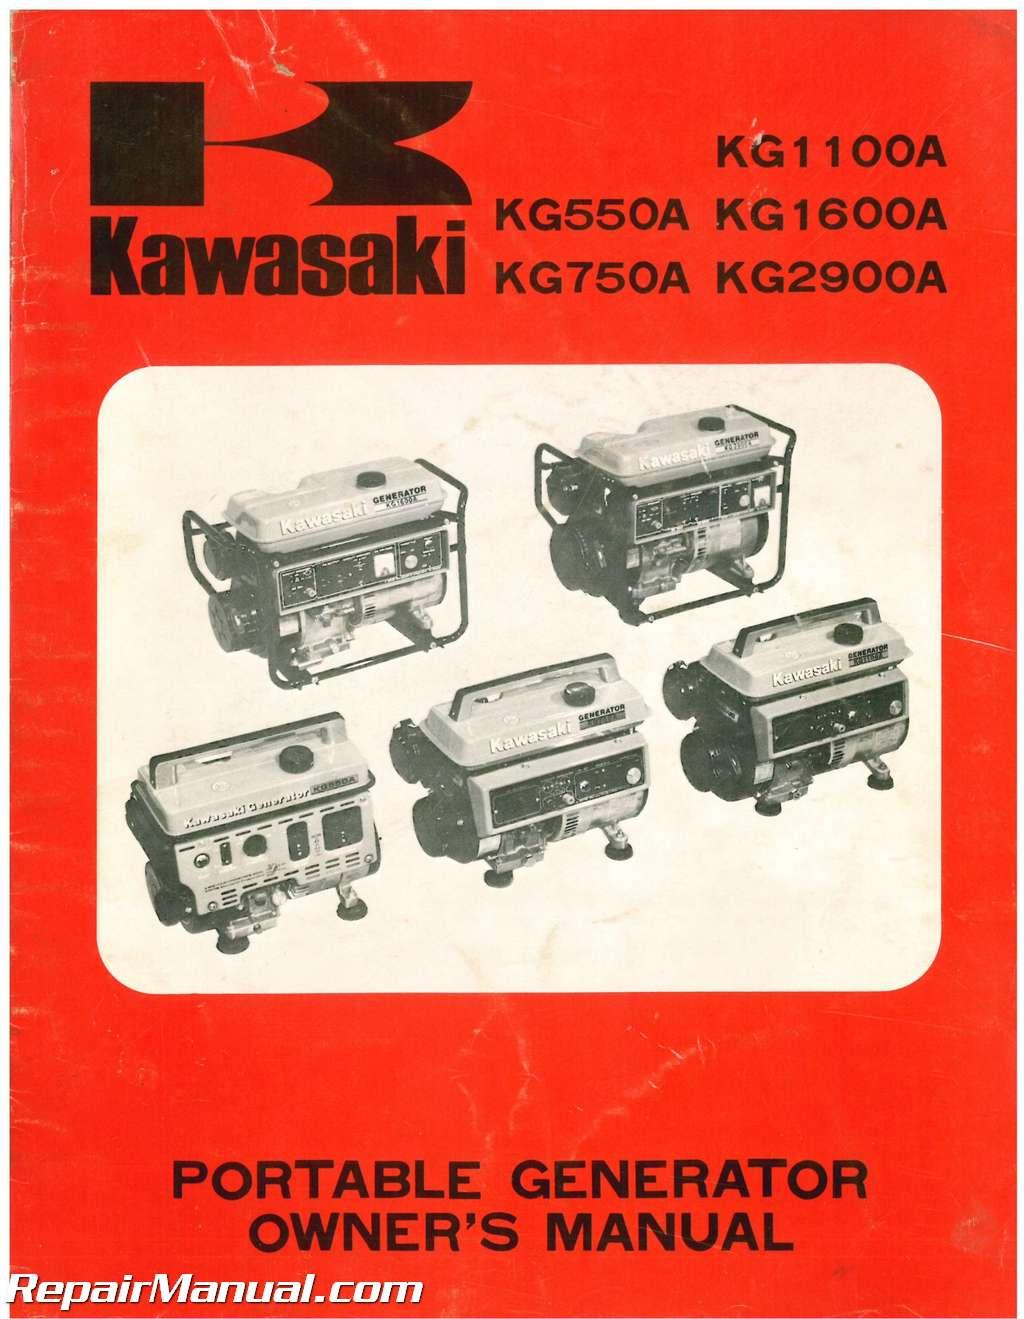 free wiring diagrams vw golf mk1 indicator diagram used kawasaki kg550a kg750a kg1100a kg1600a kg2900a portable generator owners manual